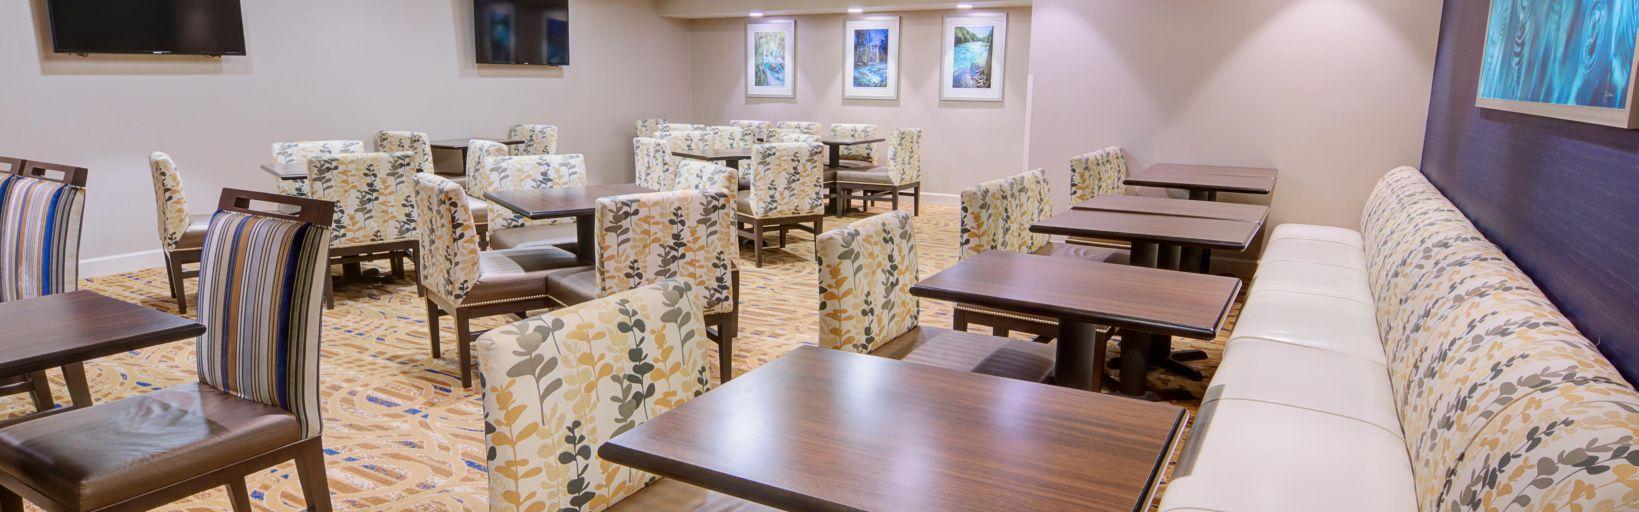 Holiday Inn Gainesville University Ctr Hotel By Ihg